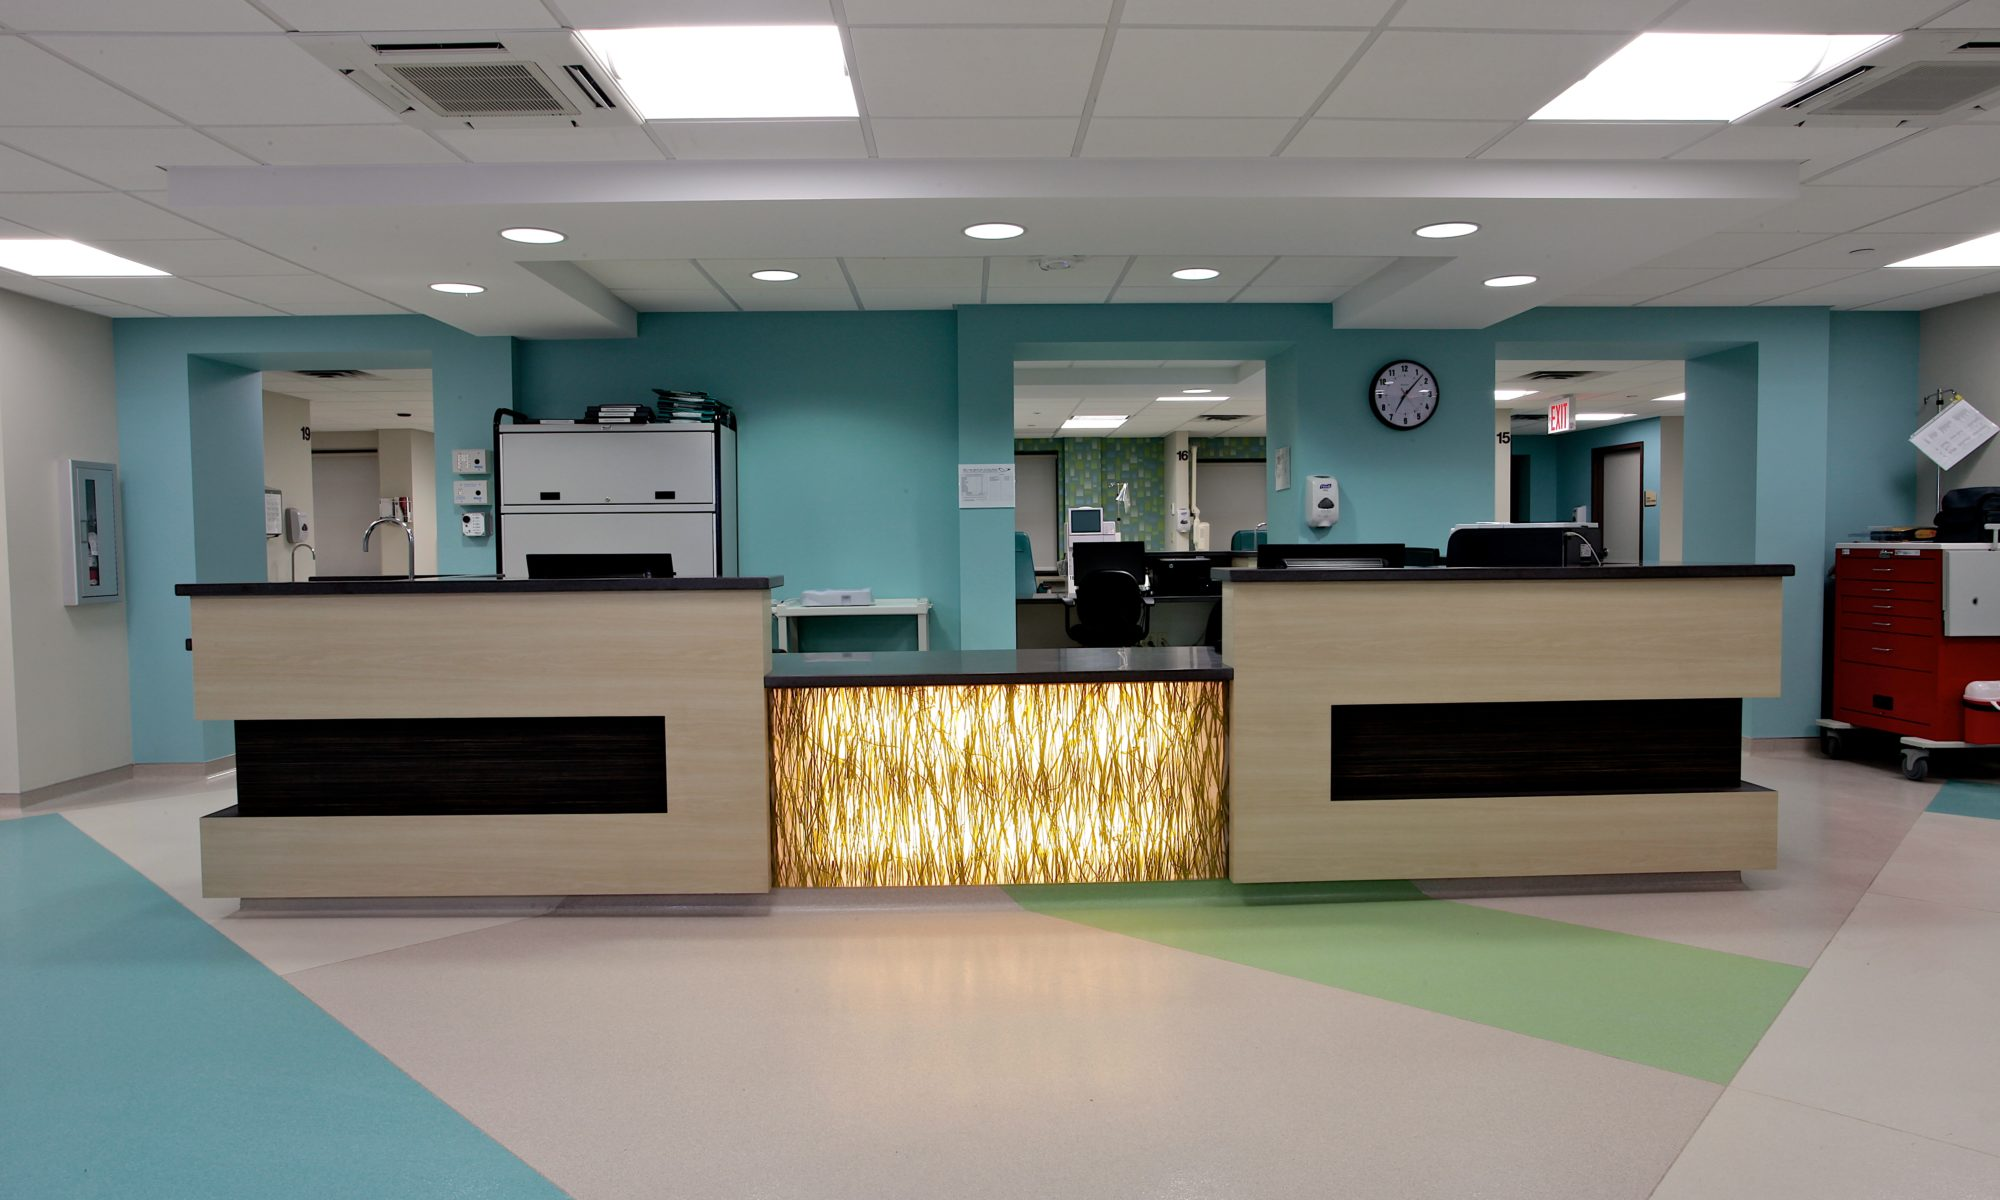 Health care architecture john w. baumgarten architect p.c.